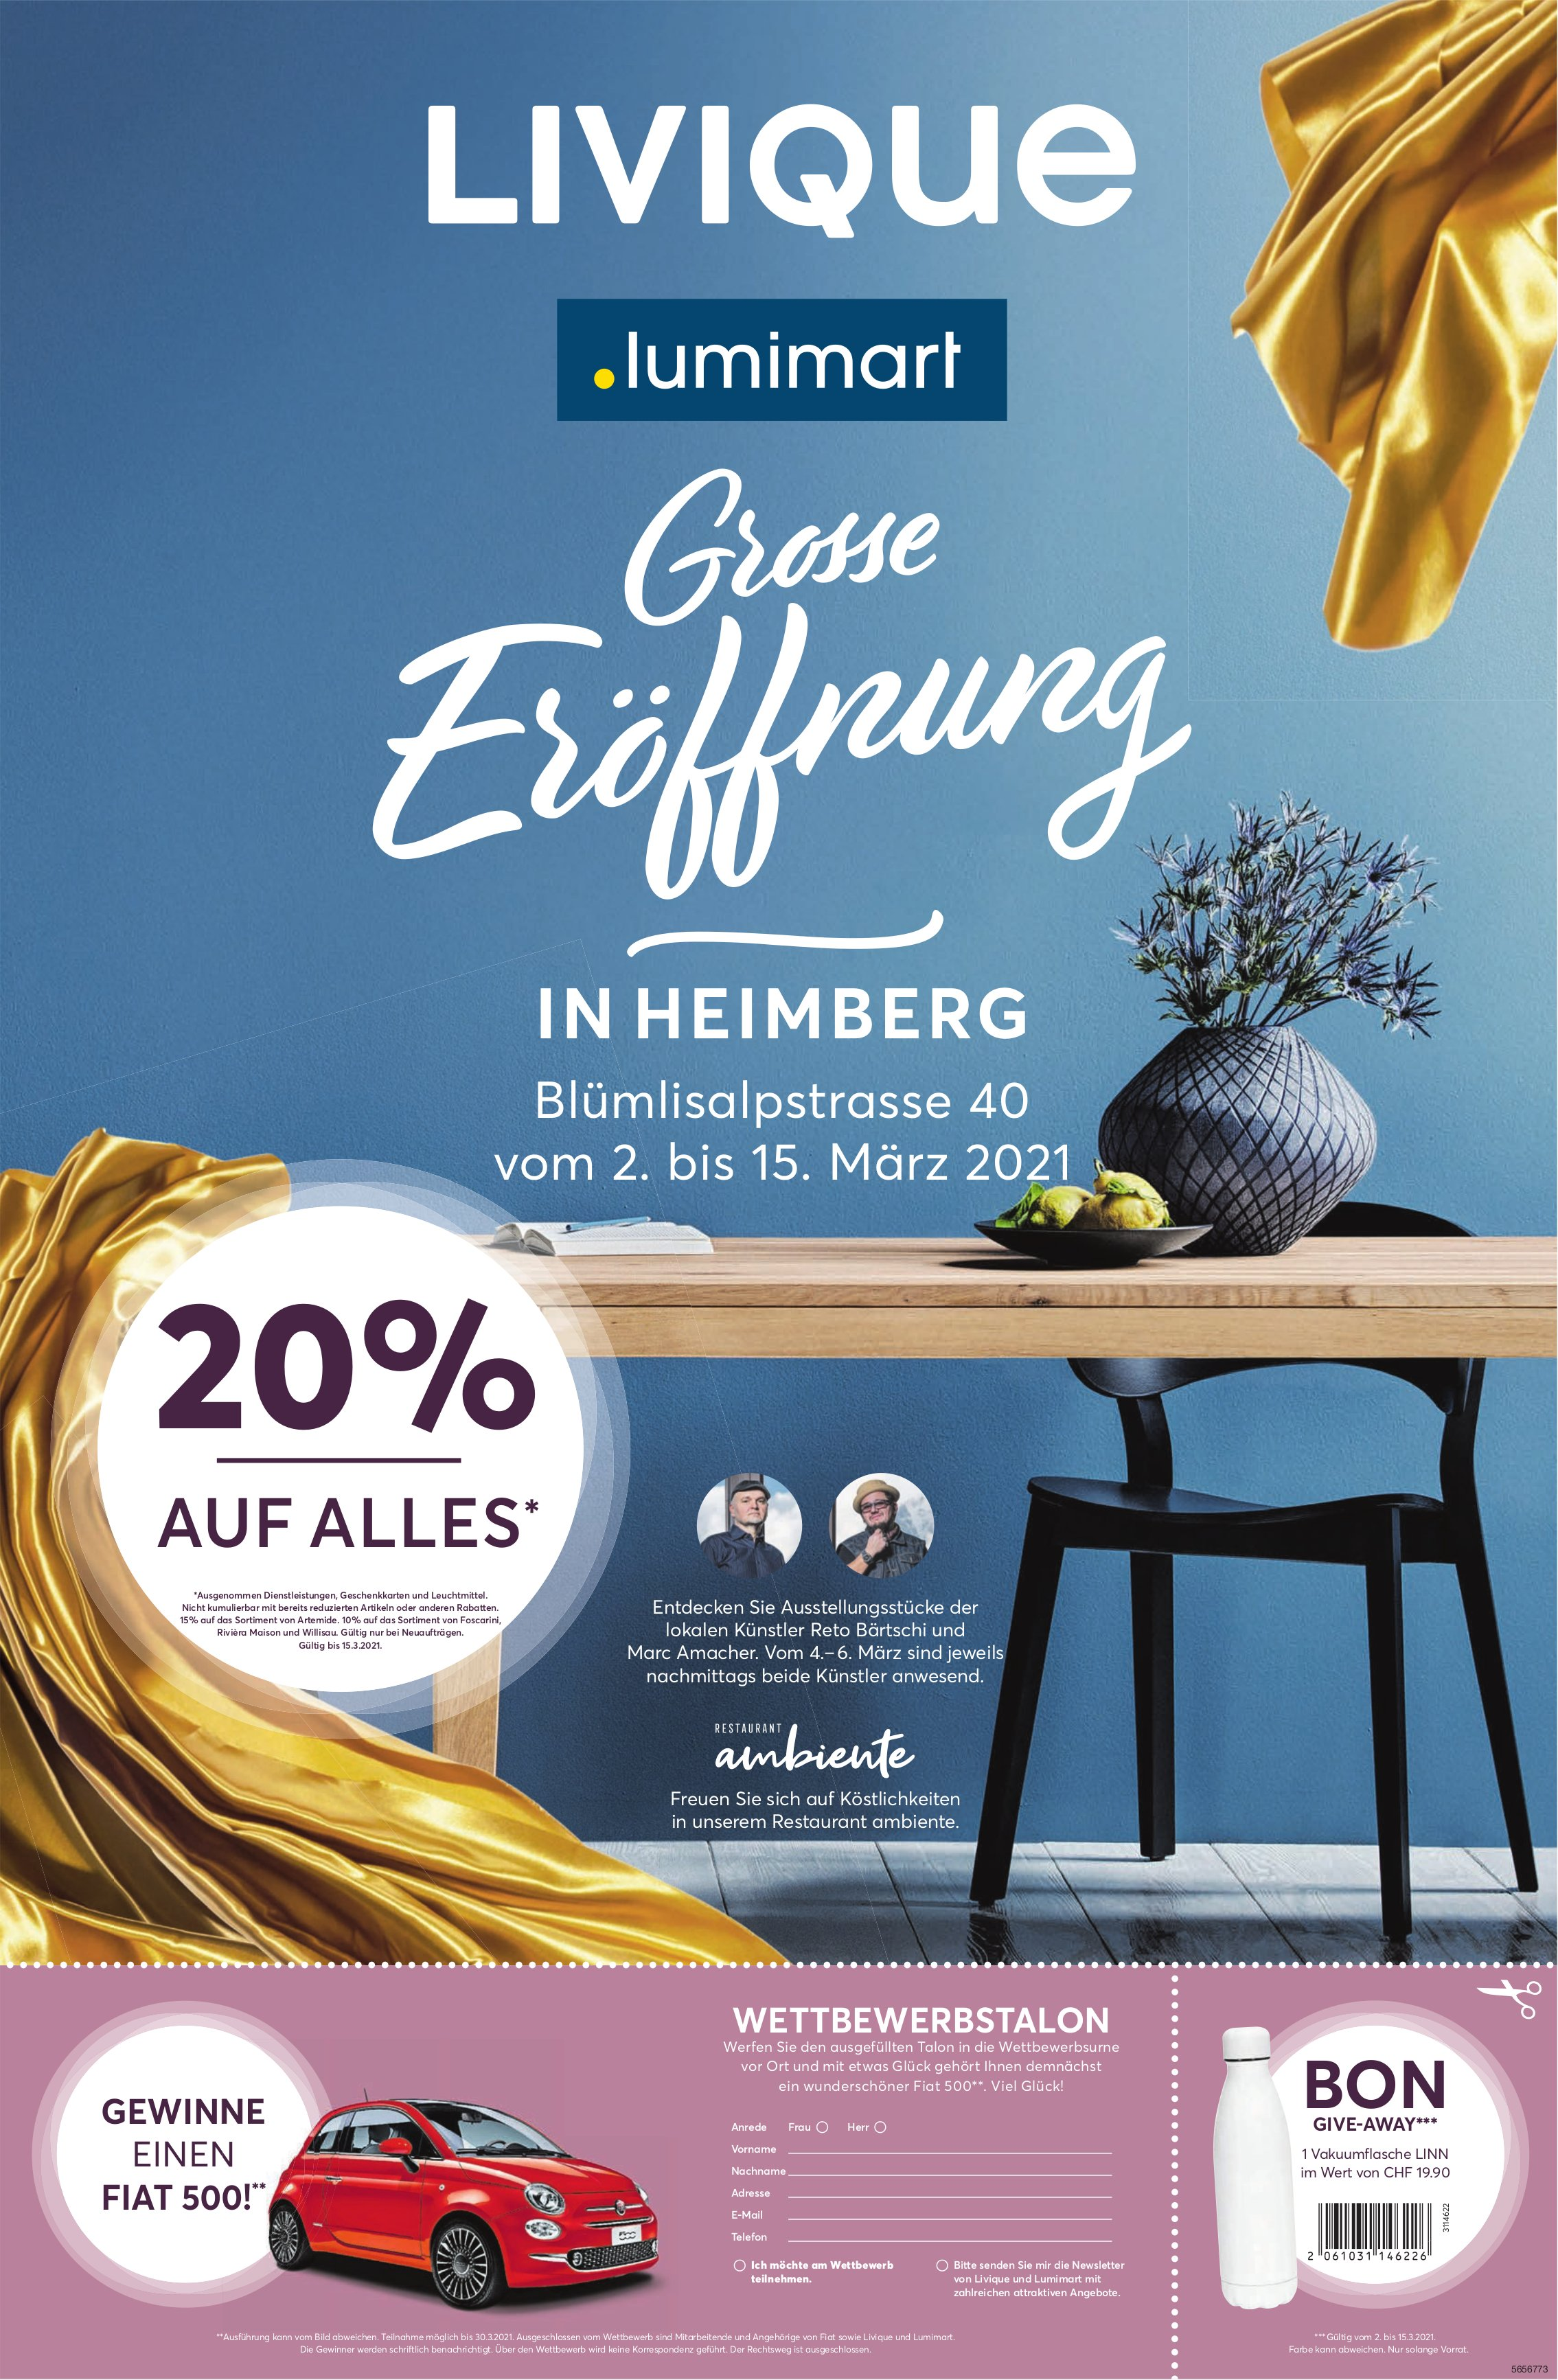 Grosse Eröffnung, 2. März, Livique, lumimart, Heimberg